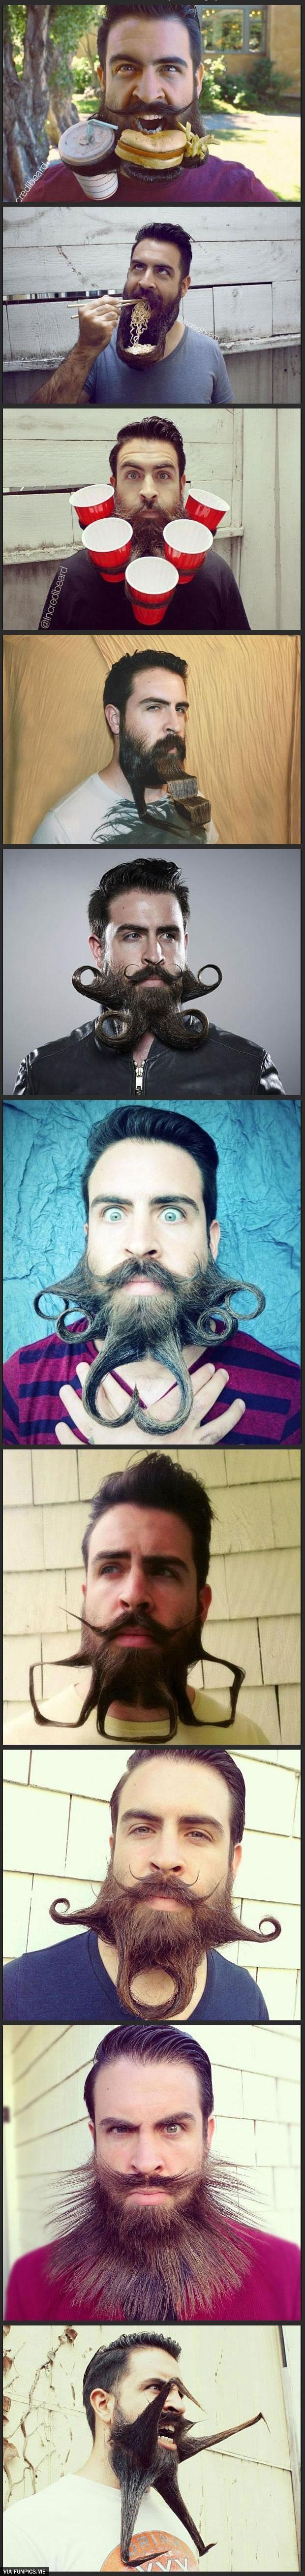 nice In honor of No Shave November, Crazy Beard Guy